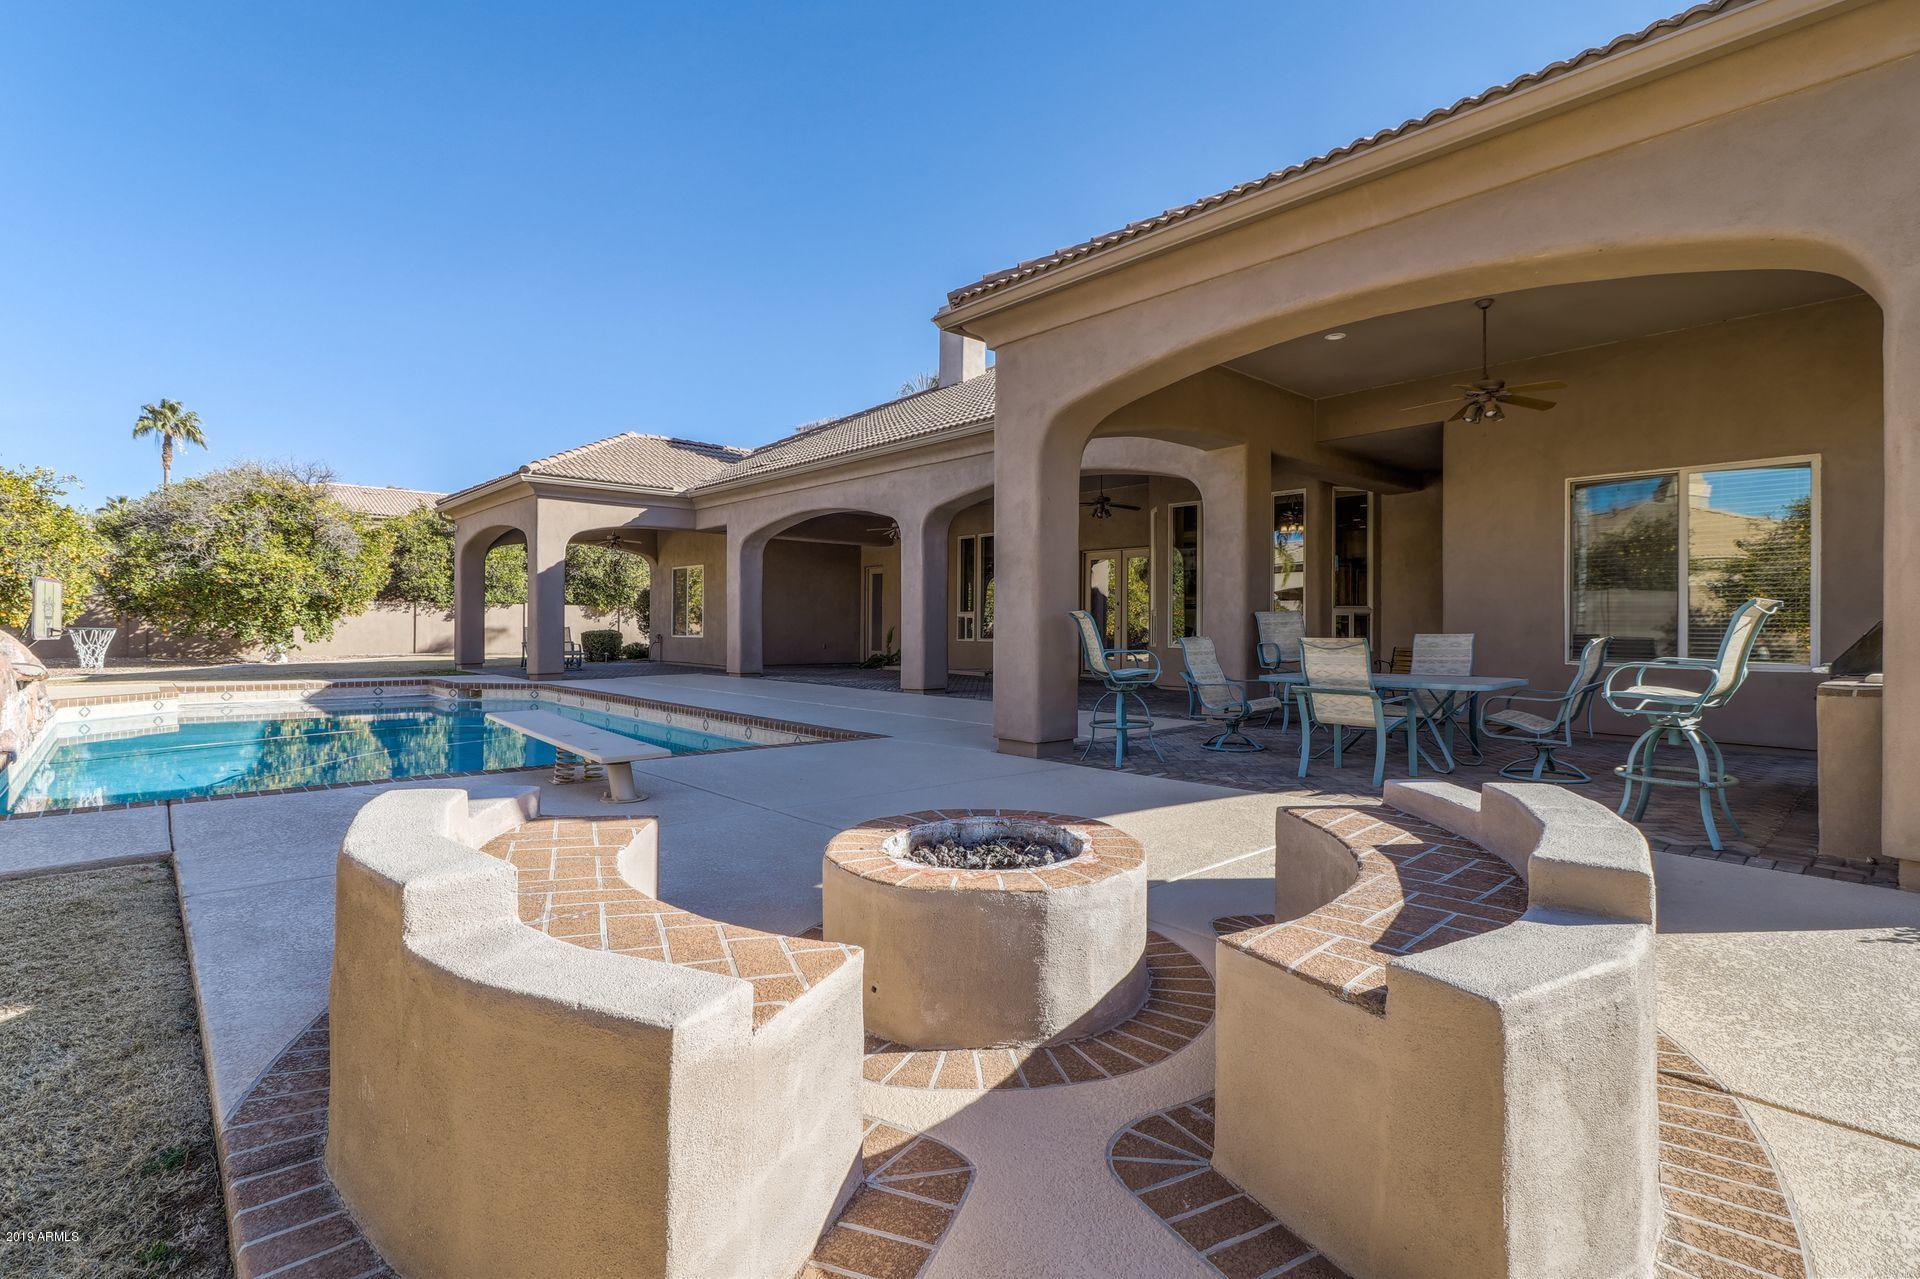 MLS 5940883 3928 E MINTON Circle, Mesa, AZ 85215 Northeast Mesa